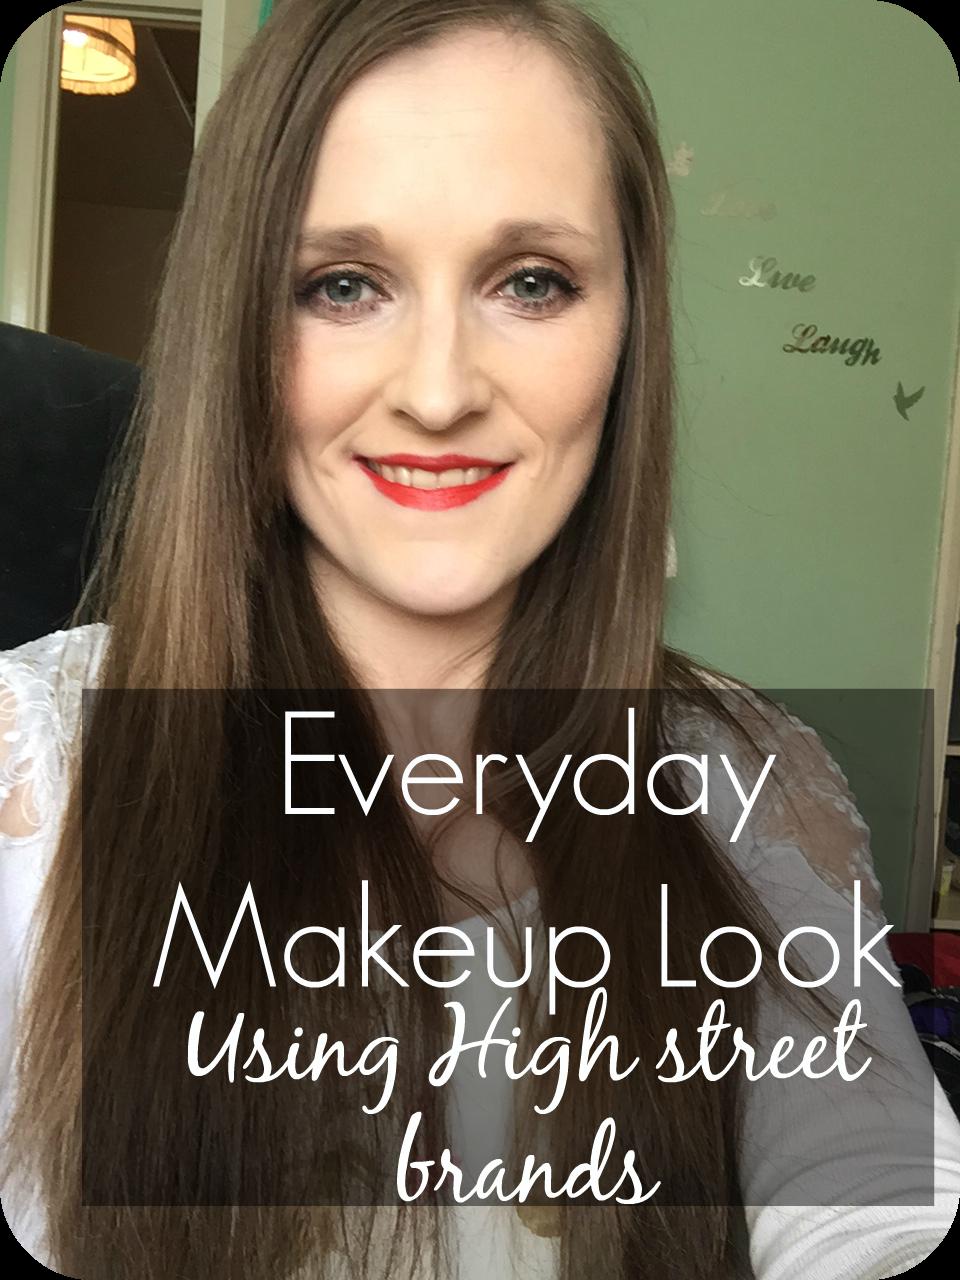 everyday makeup look using high street brands